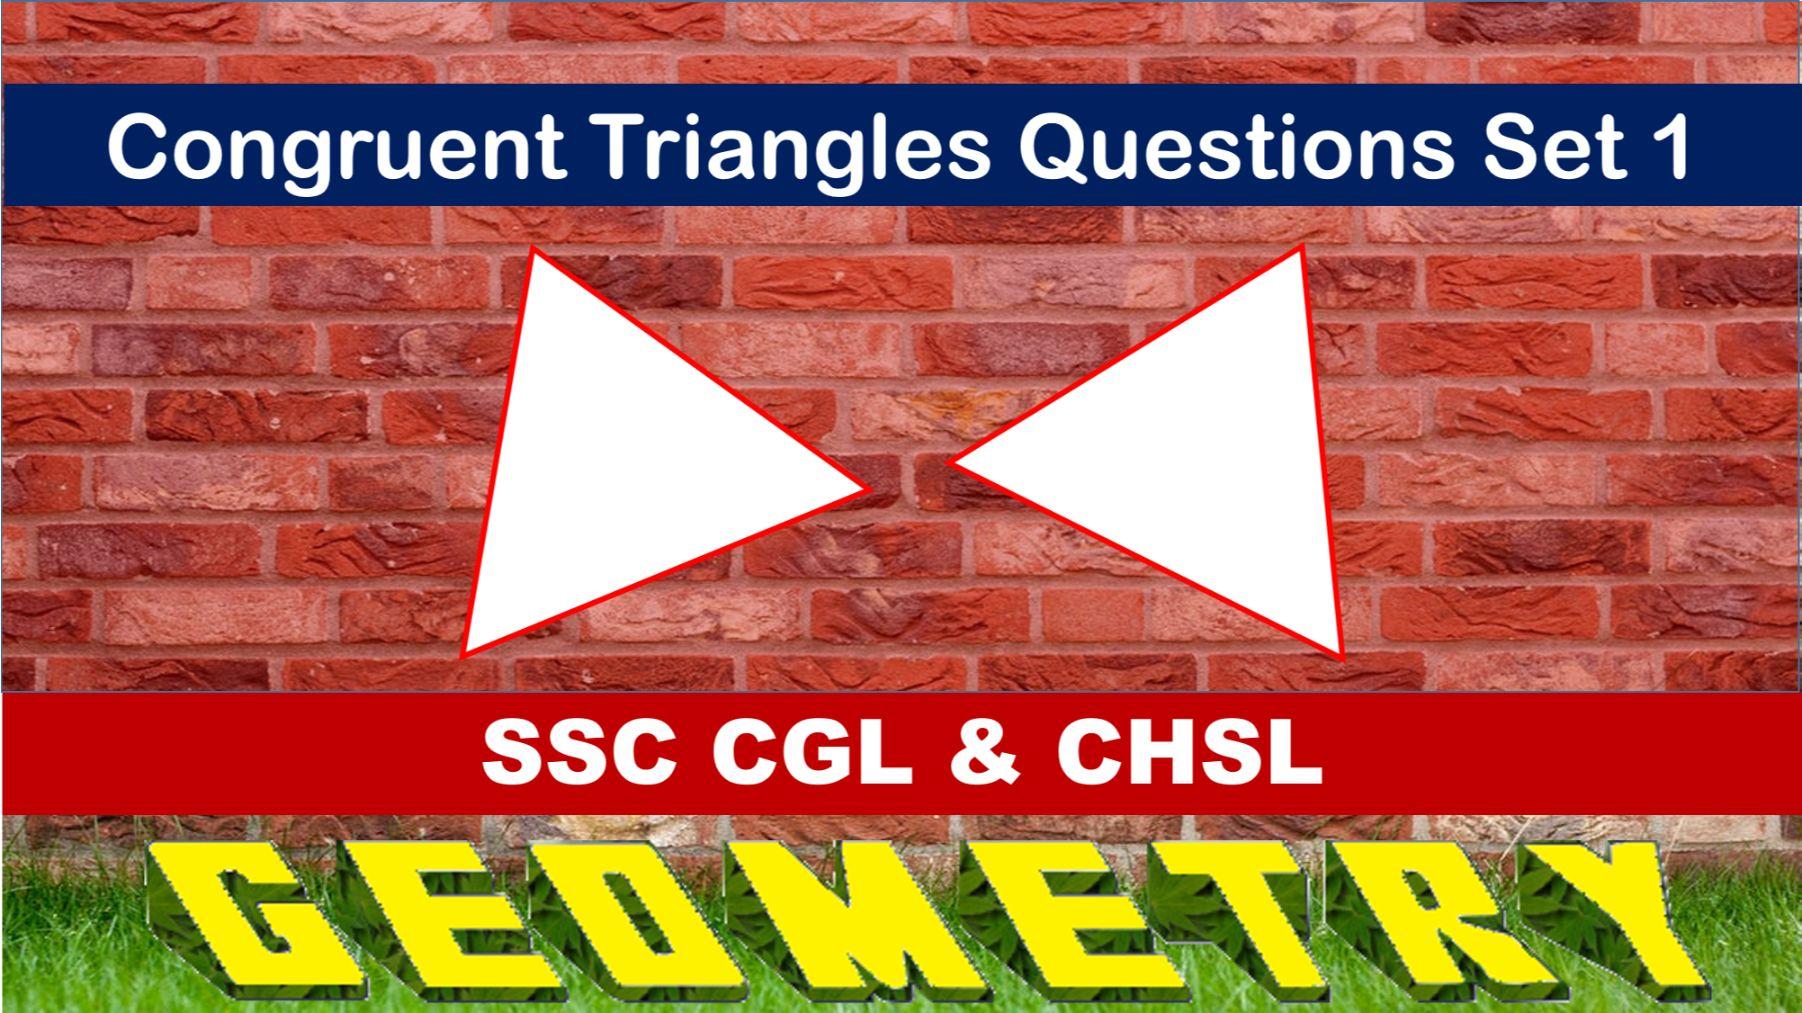 SSC CGL Geometry Congrunet Triangles Set 1